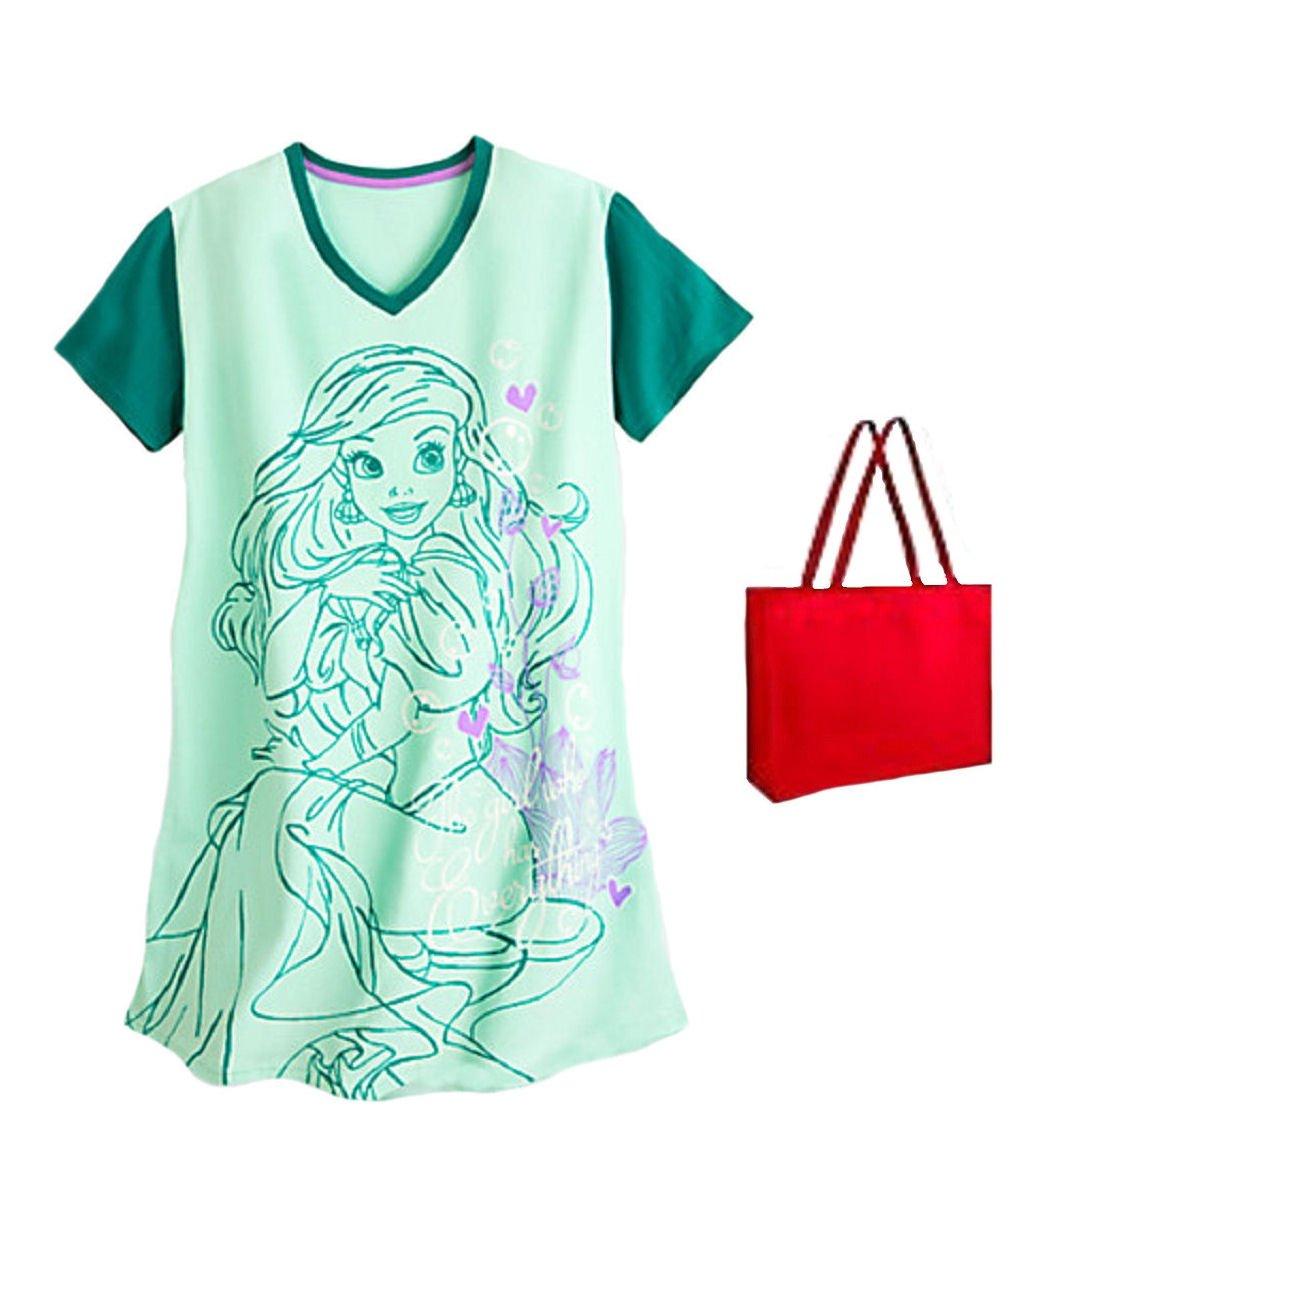 Disney Womens' Ariel Nightshirt Mermaid Green and Gift Bag (3XL)